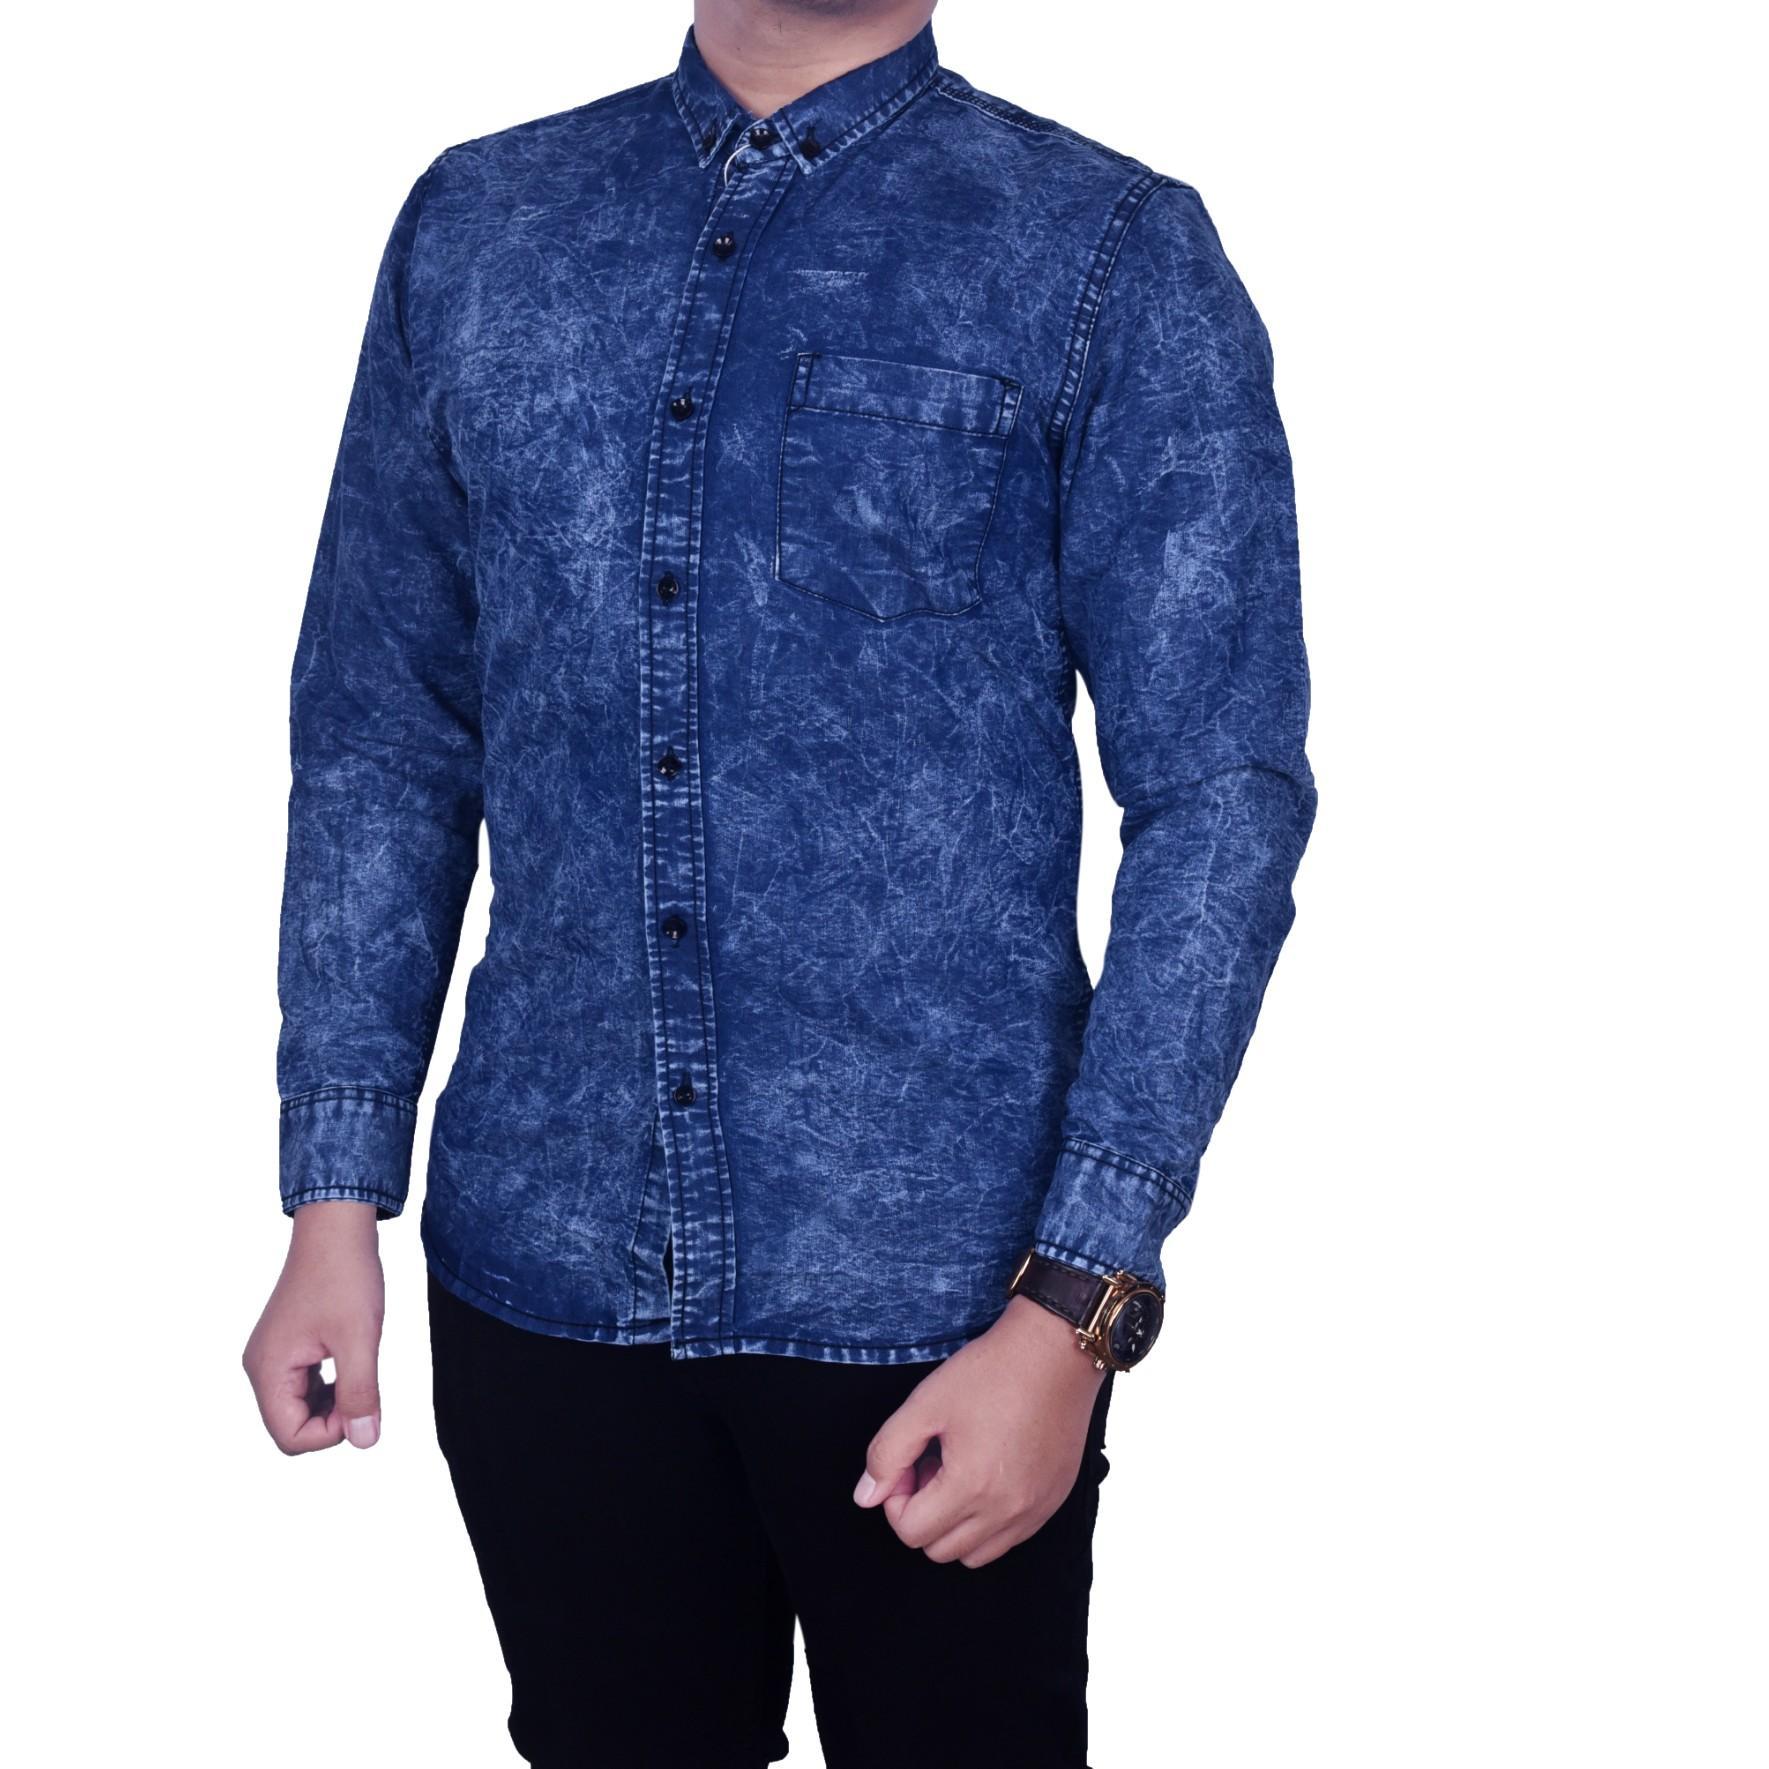 ... Biru Katalog Harga Source · SB Collection Atasan Blouse Celine Kemeja Jumbo Hitam Source Dgm Fashion1 Kemeja Jeans Pria Lengan Panjang